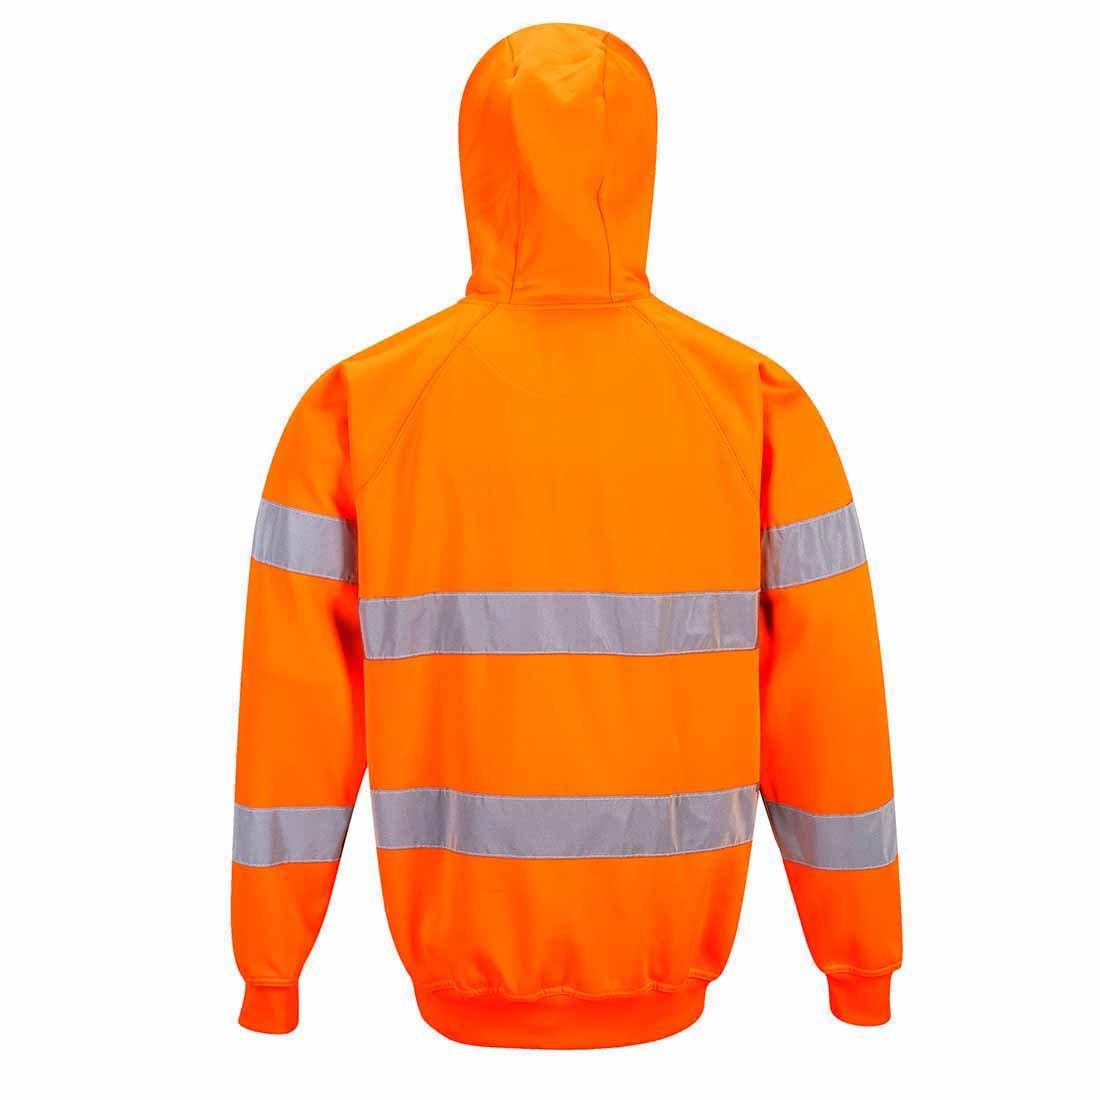 B304YERXXL Portwest B304/Hi-Vis with Hood for Children